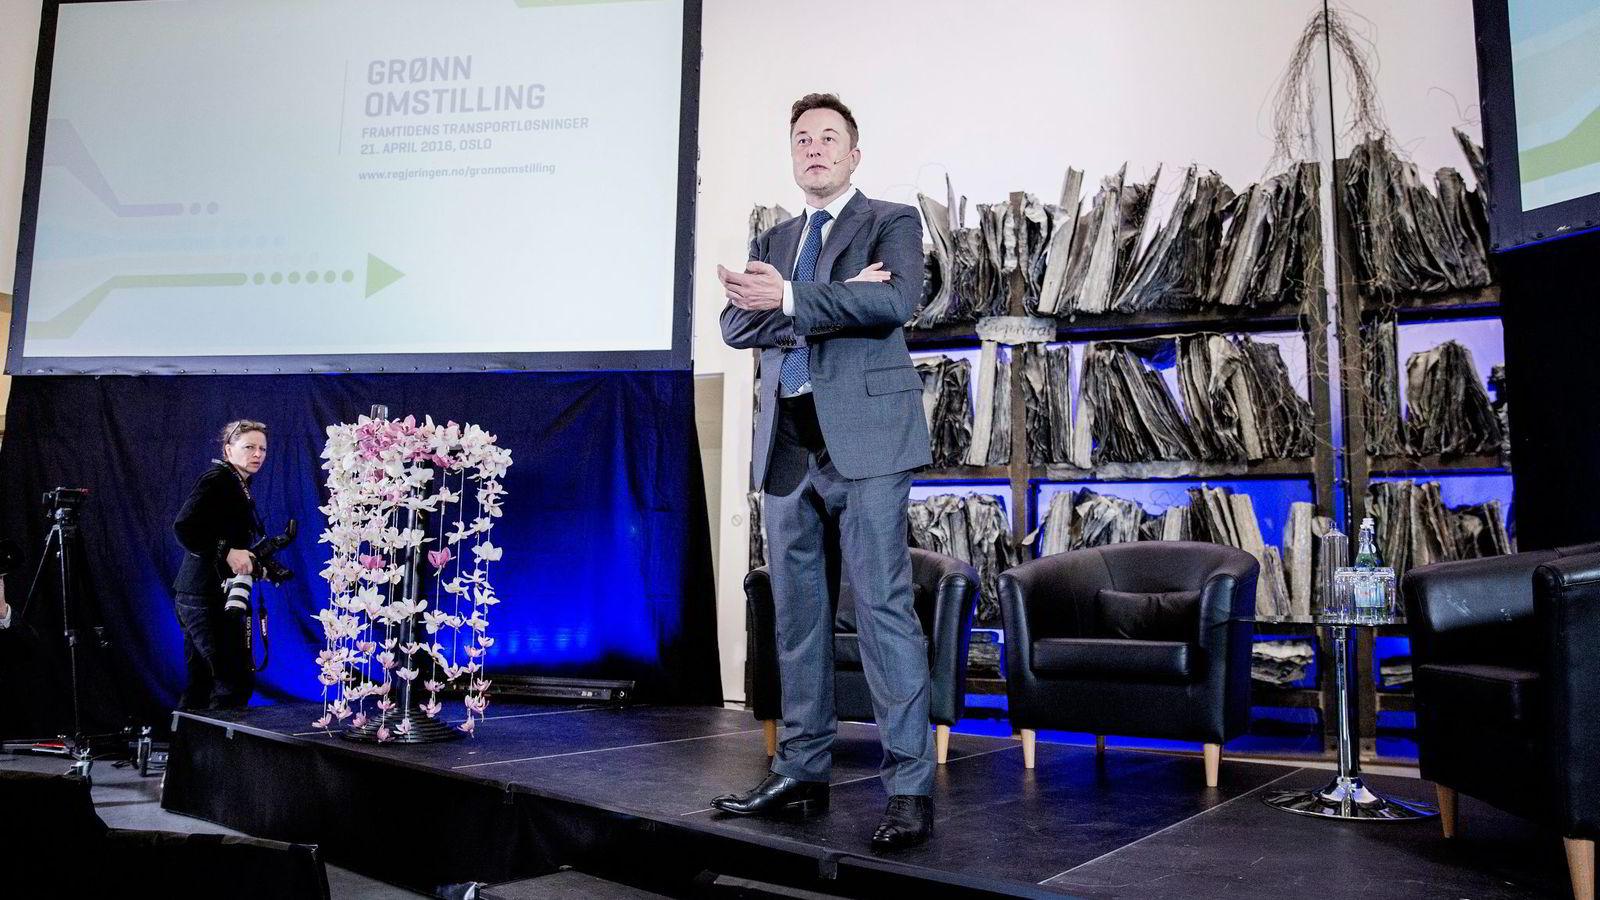 Tesla-sjef Elon Musk var en av hovedgjestene under Regjeringens transportkonferanse i Oslo i april. Foto: Fredrik Bjerknes